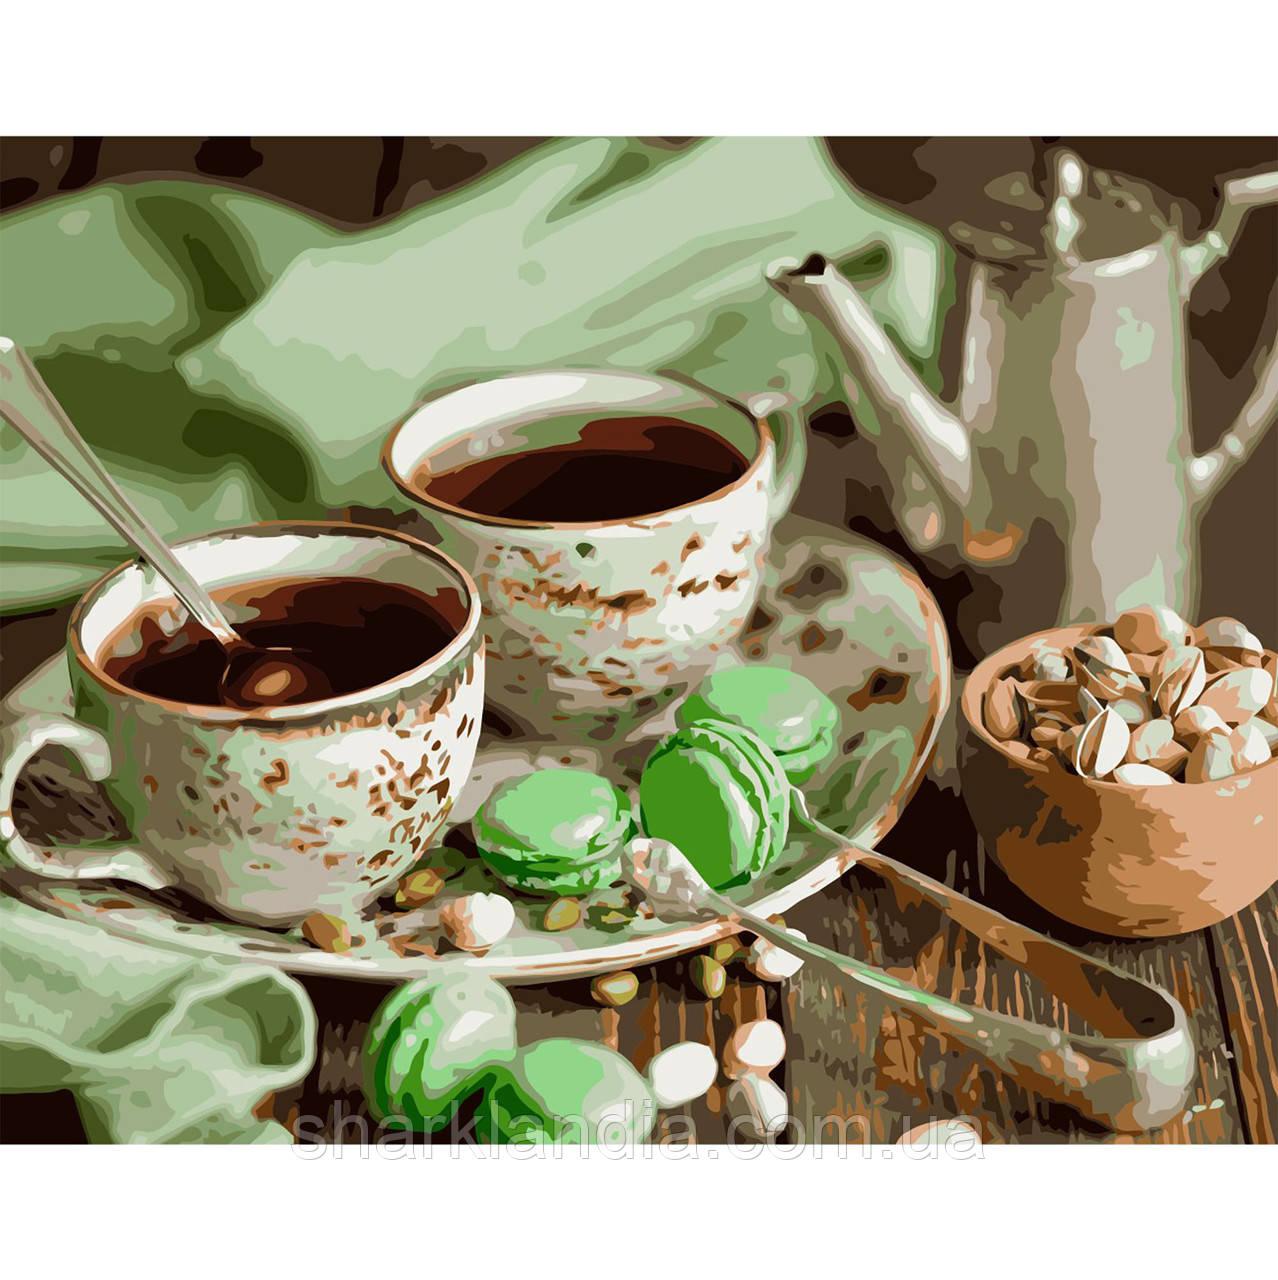 Картина по номерам Кофе на двоих с макарунами 40х50см Strateg